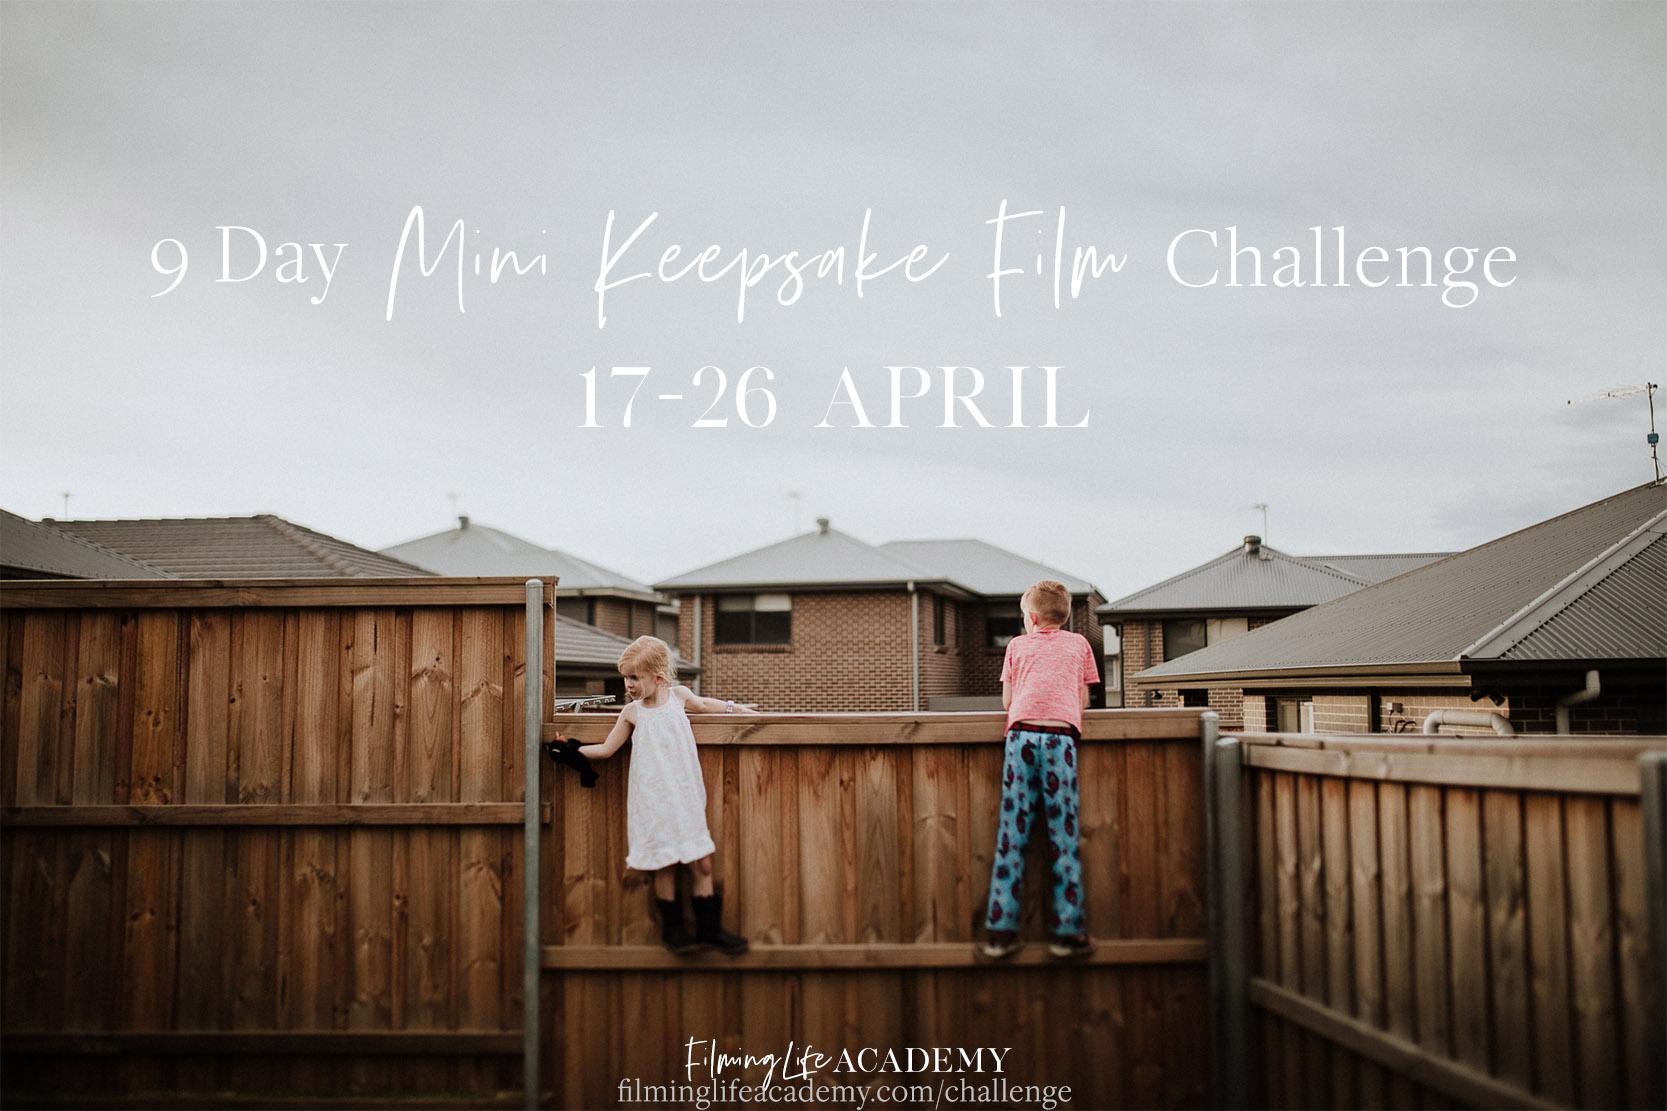 9 Day Mini Keepsake Film Challenge (with logo).jpg